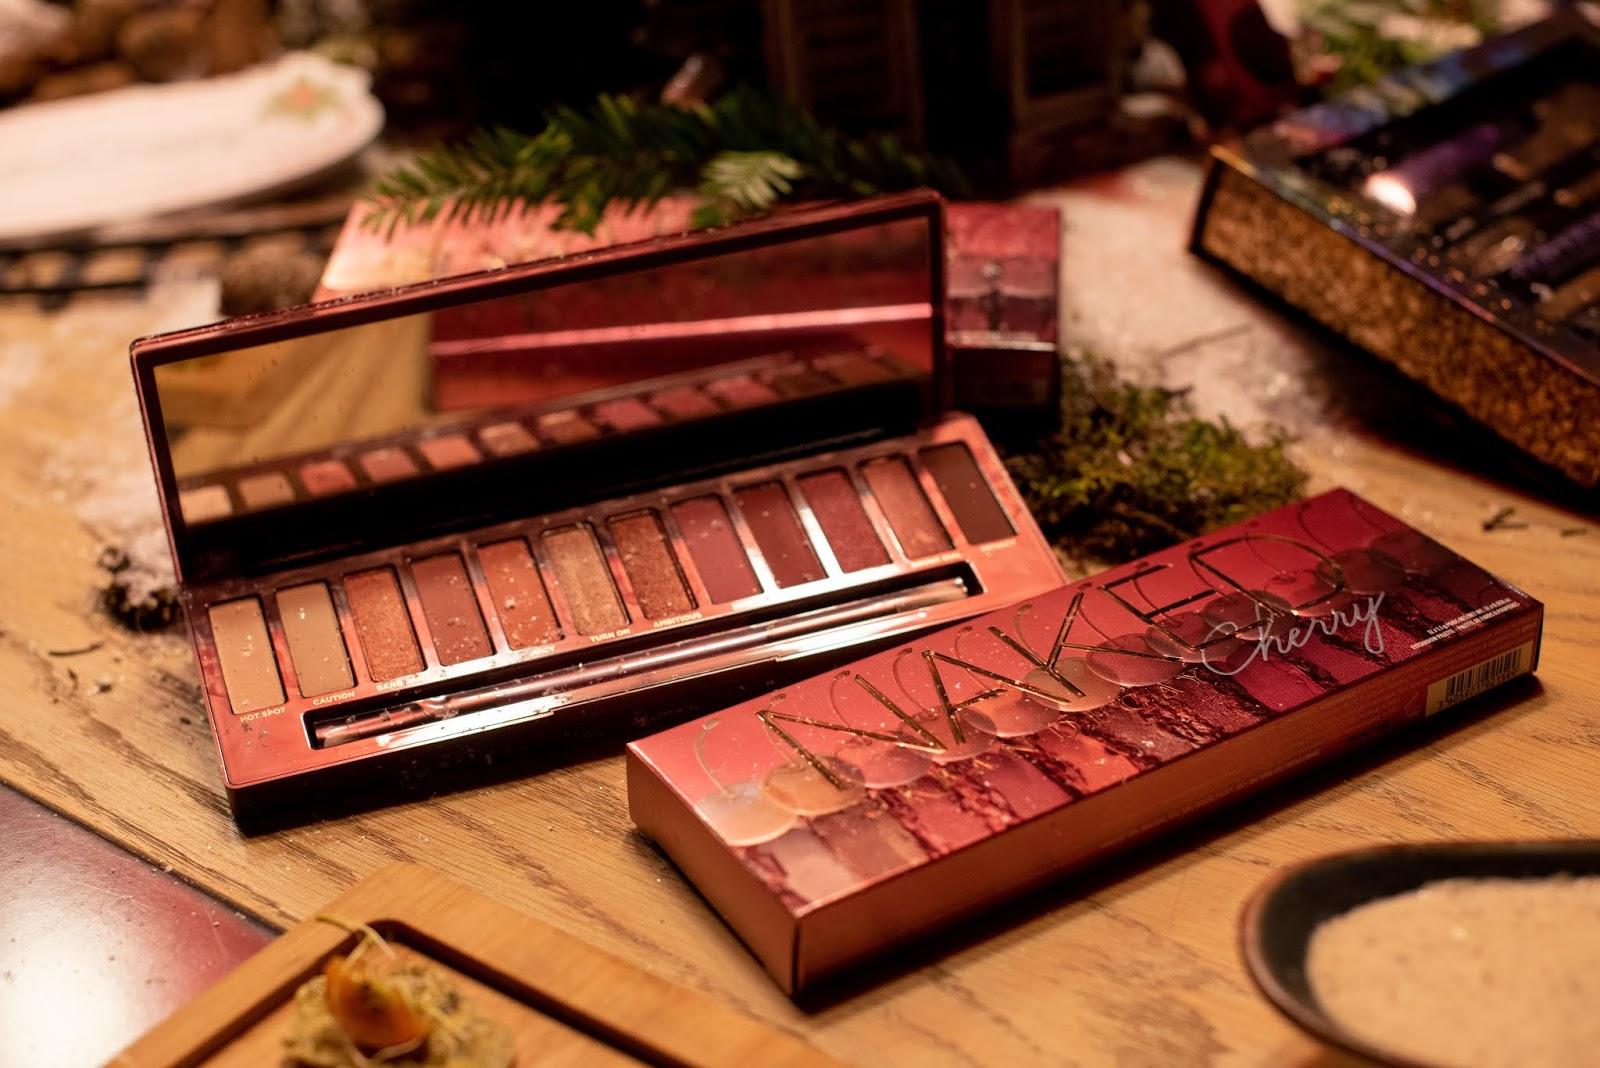 10-regalos-beauty-para-esta-navidad-naked-cherry-palette-urban-decay